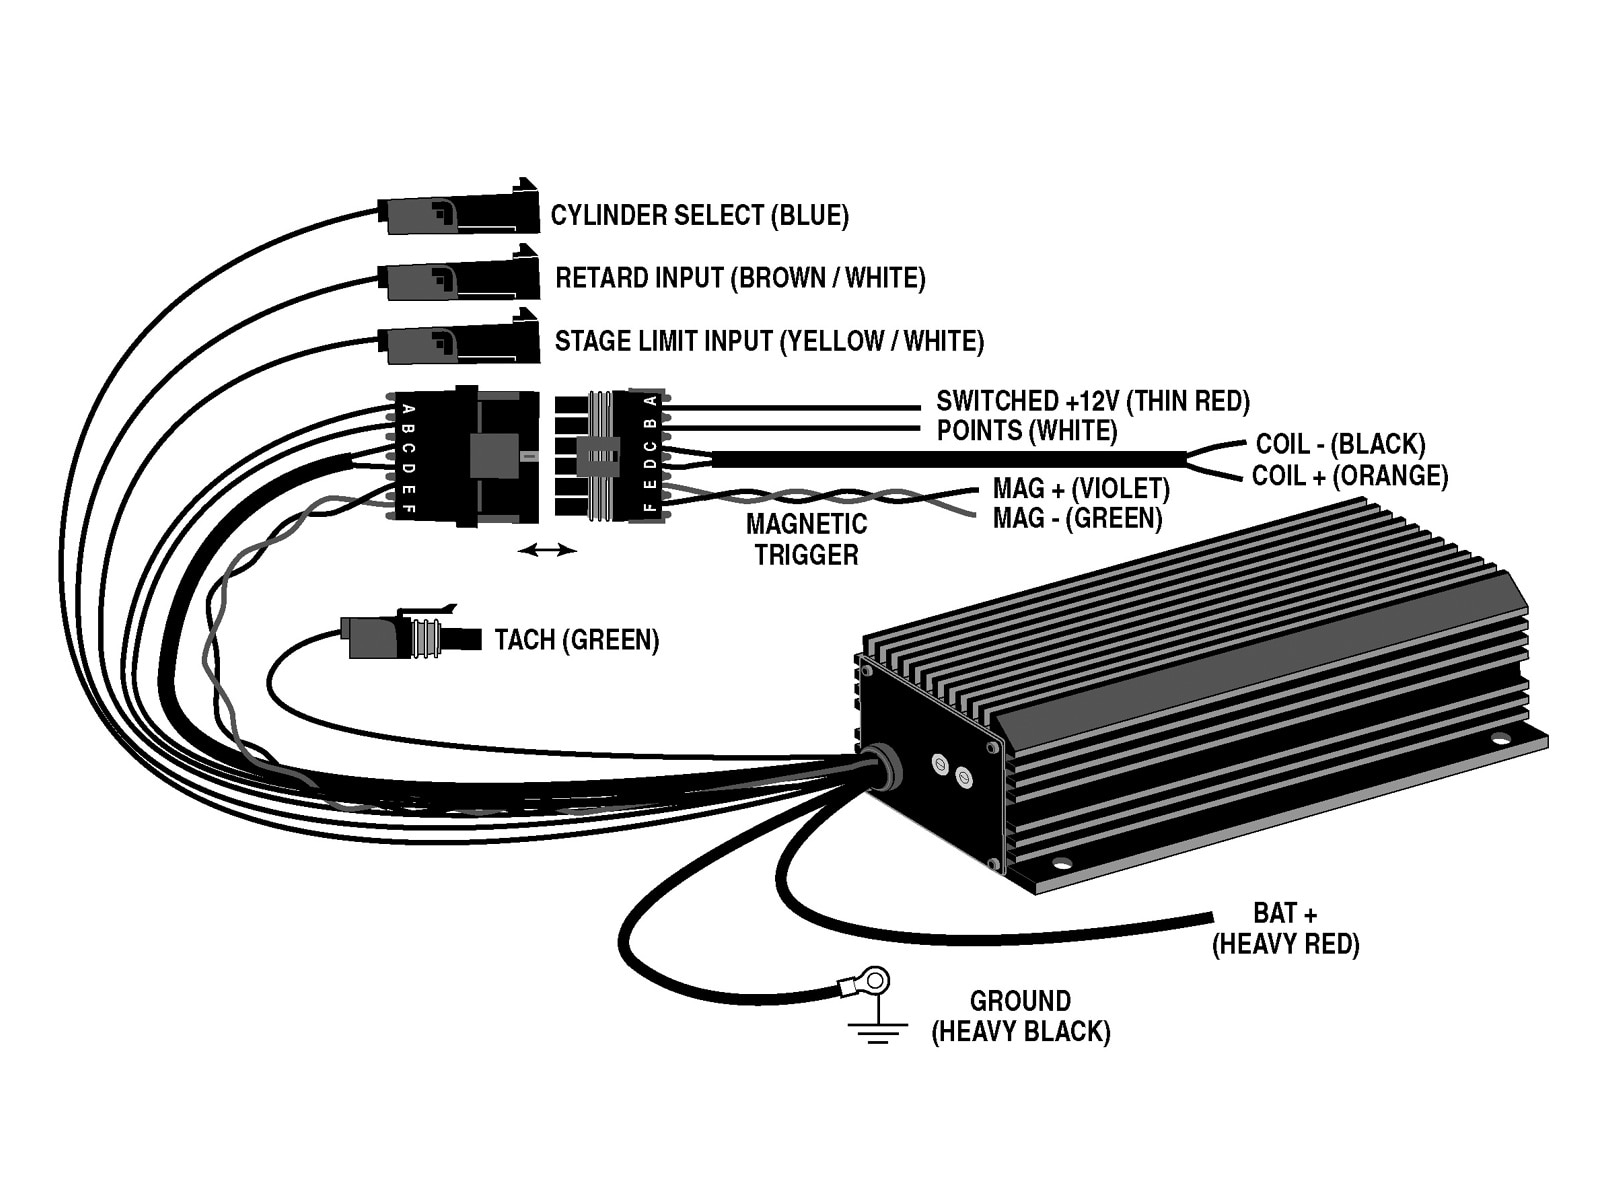 crane hi 6 wiring diagram wiring diagrams tar crane ignition hi 6rc wiring diagram crane [ 1600 x 1200 Pixel ]